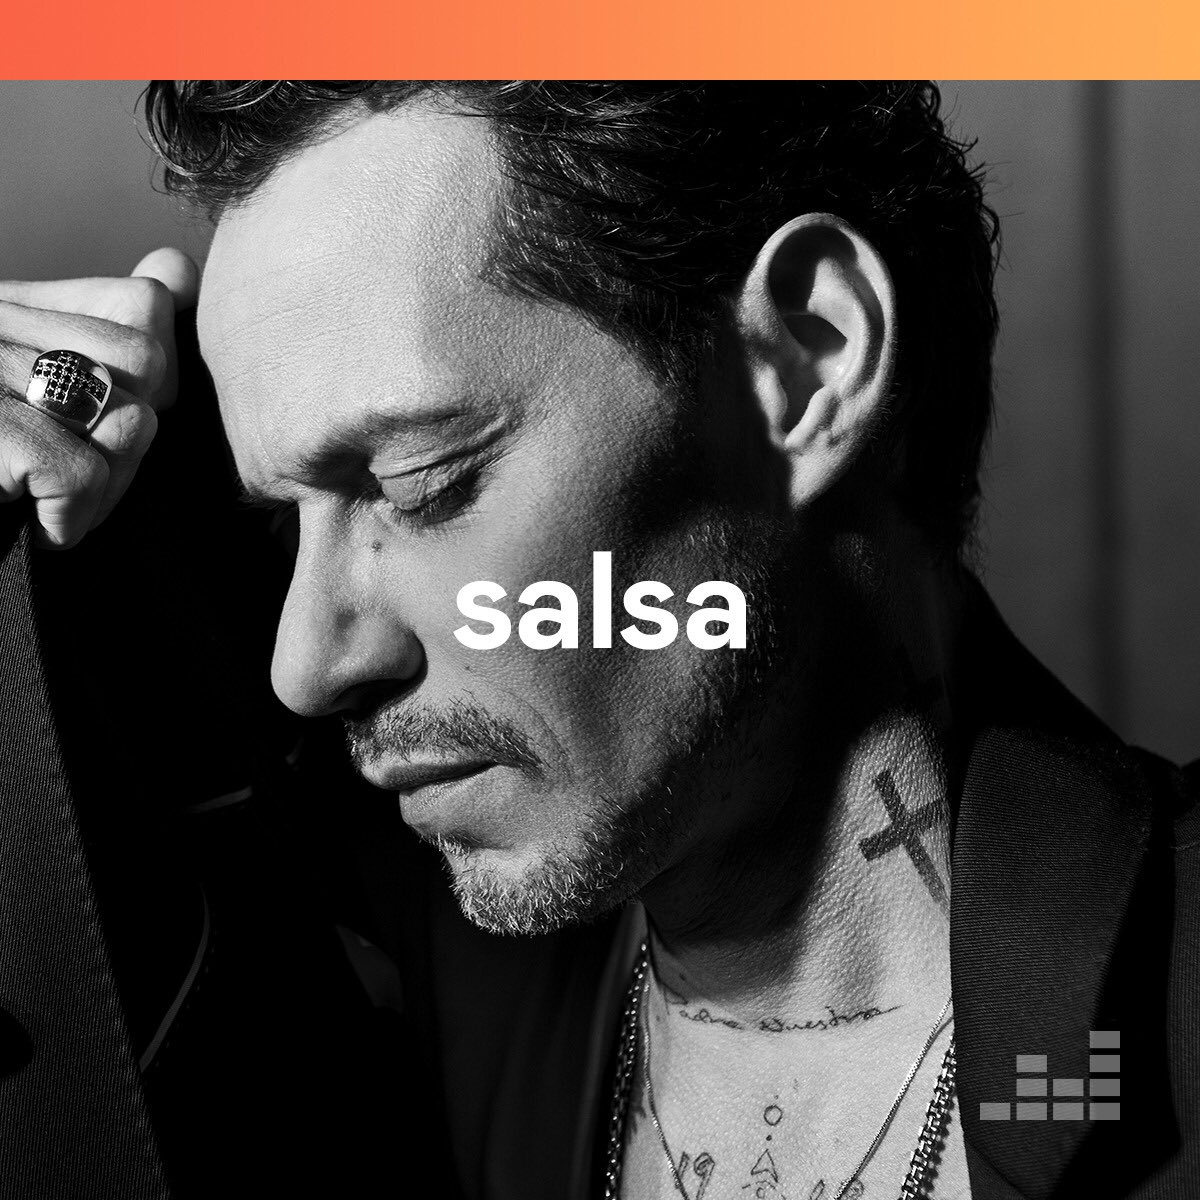 Todos a bailar #Salsa de la buena en @deezerlatino #OPUS Haz clic -> https://t.co/hbz2rJKzgX… https://t.co/e6O4P8BQHF